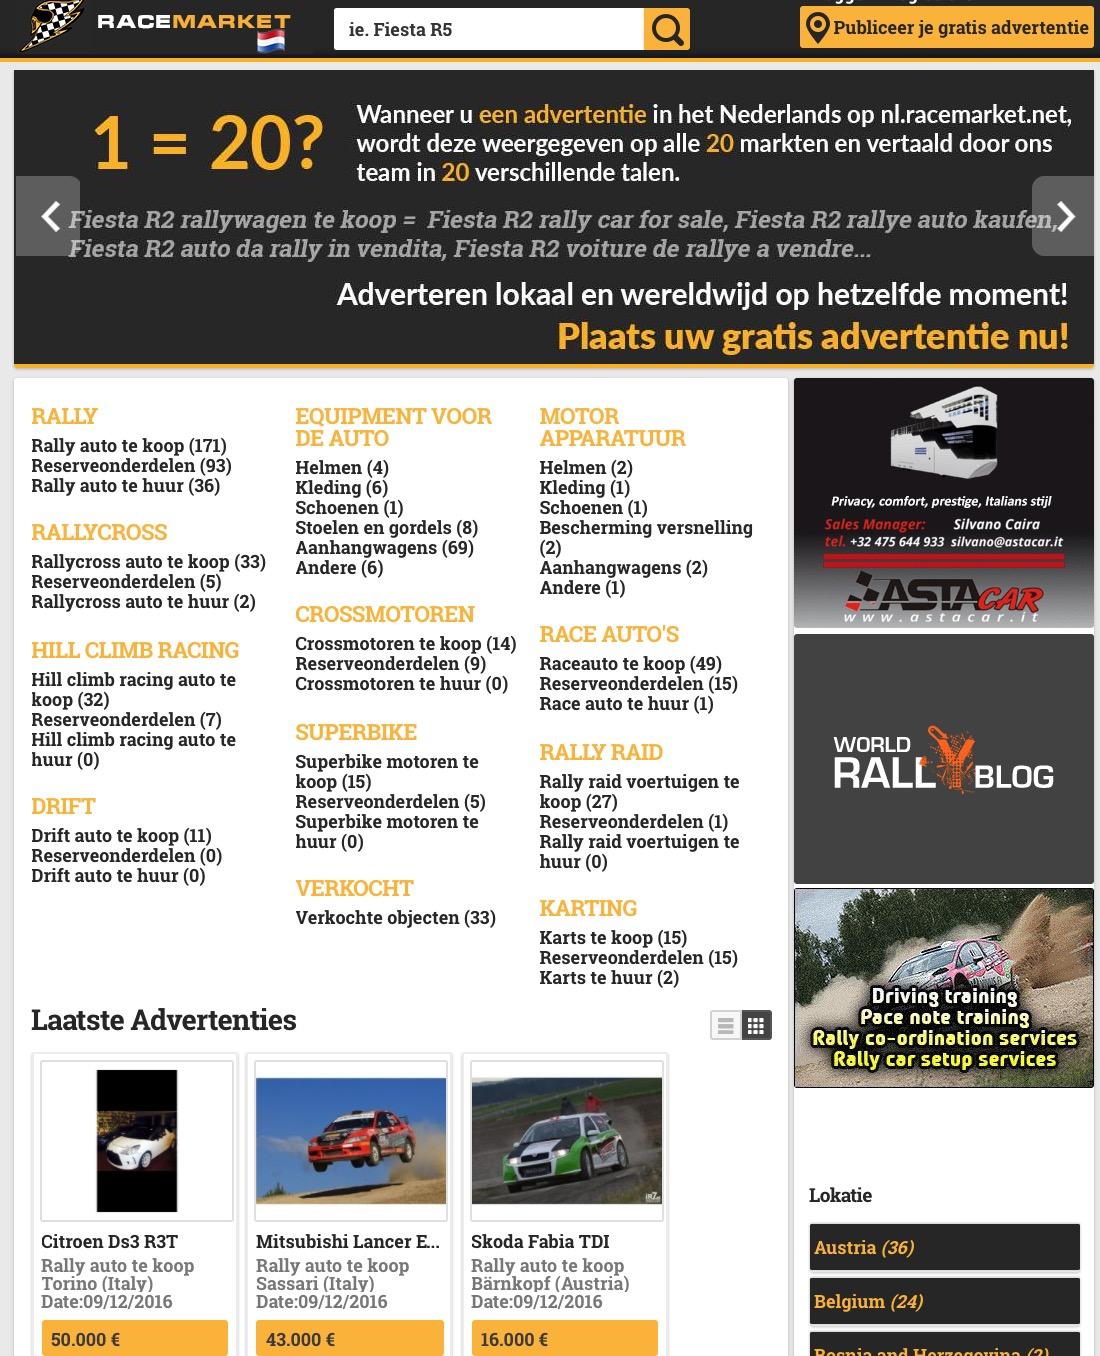 Racemarket.net Nederland